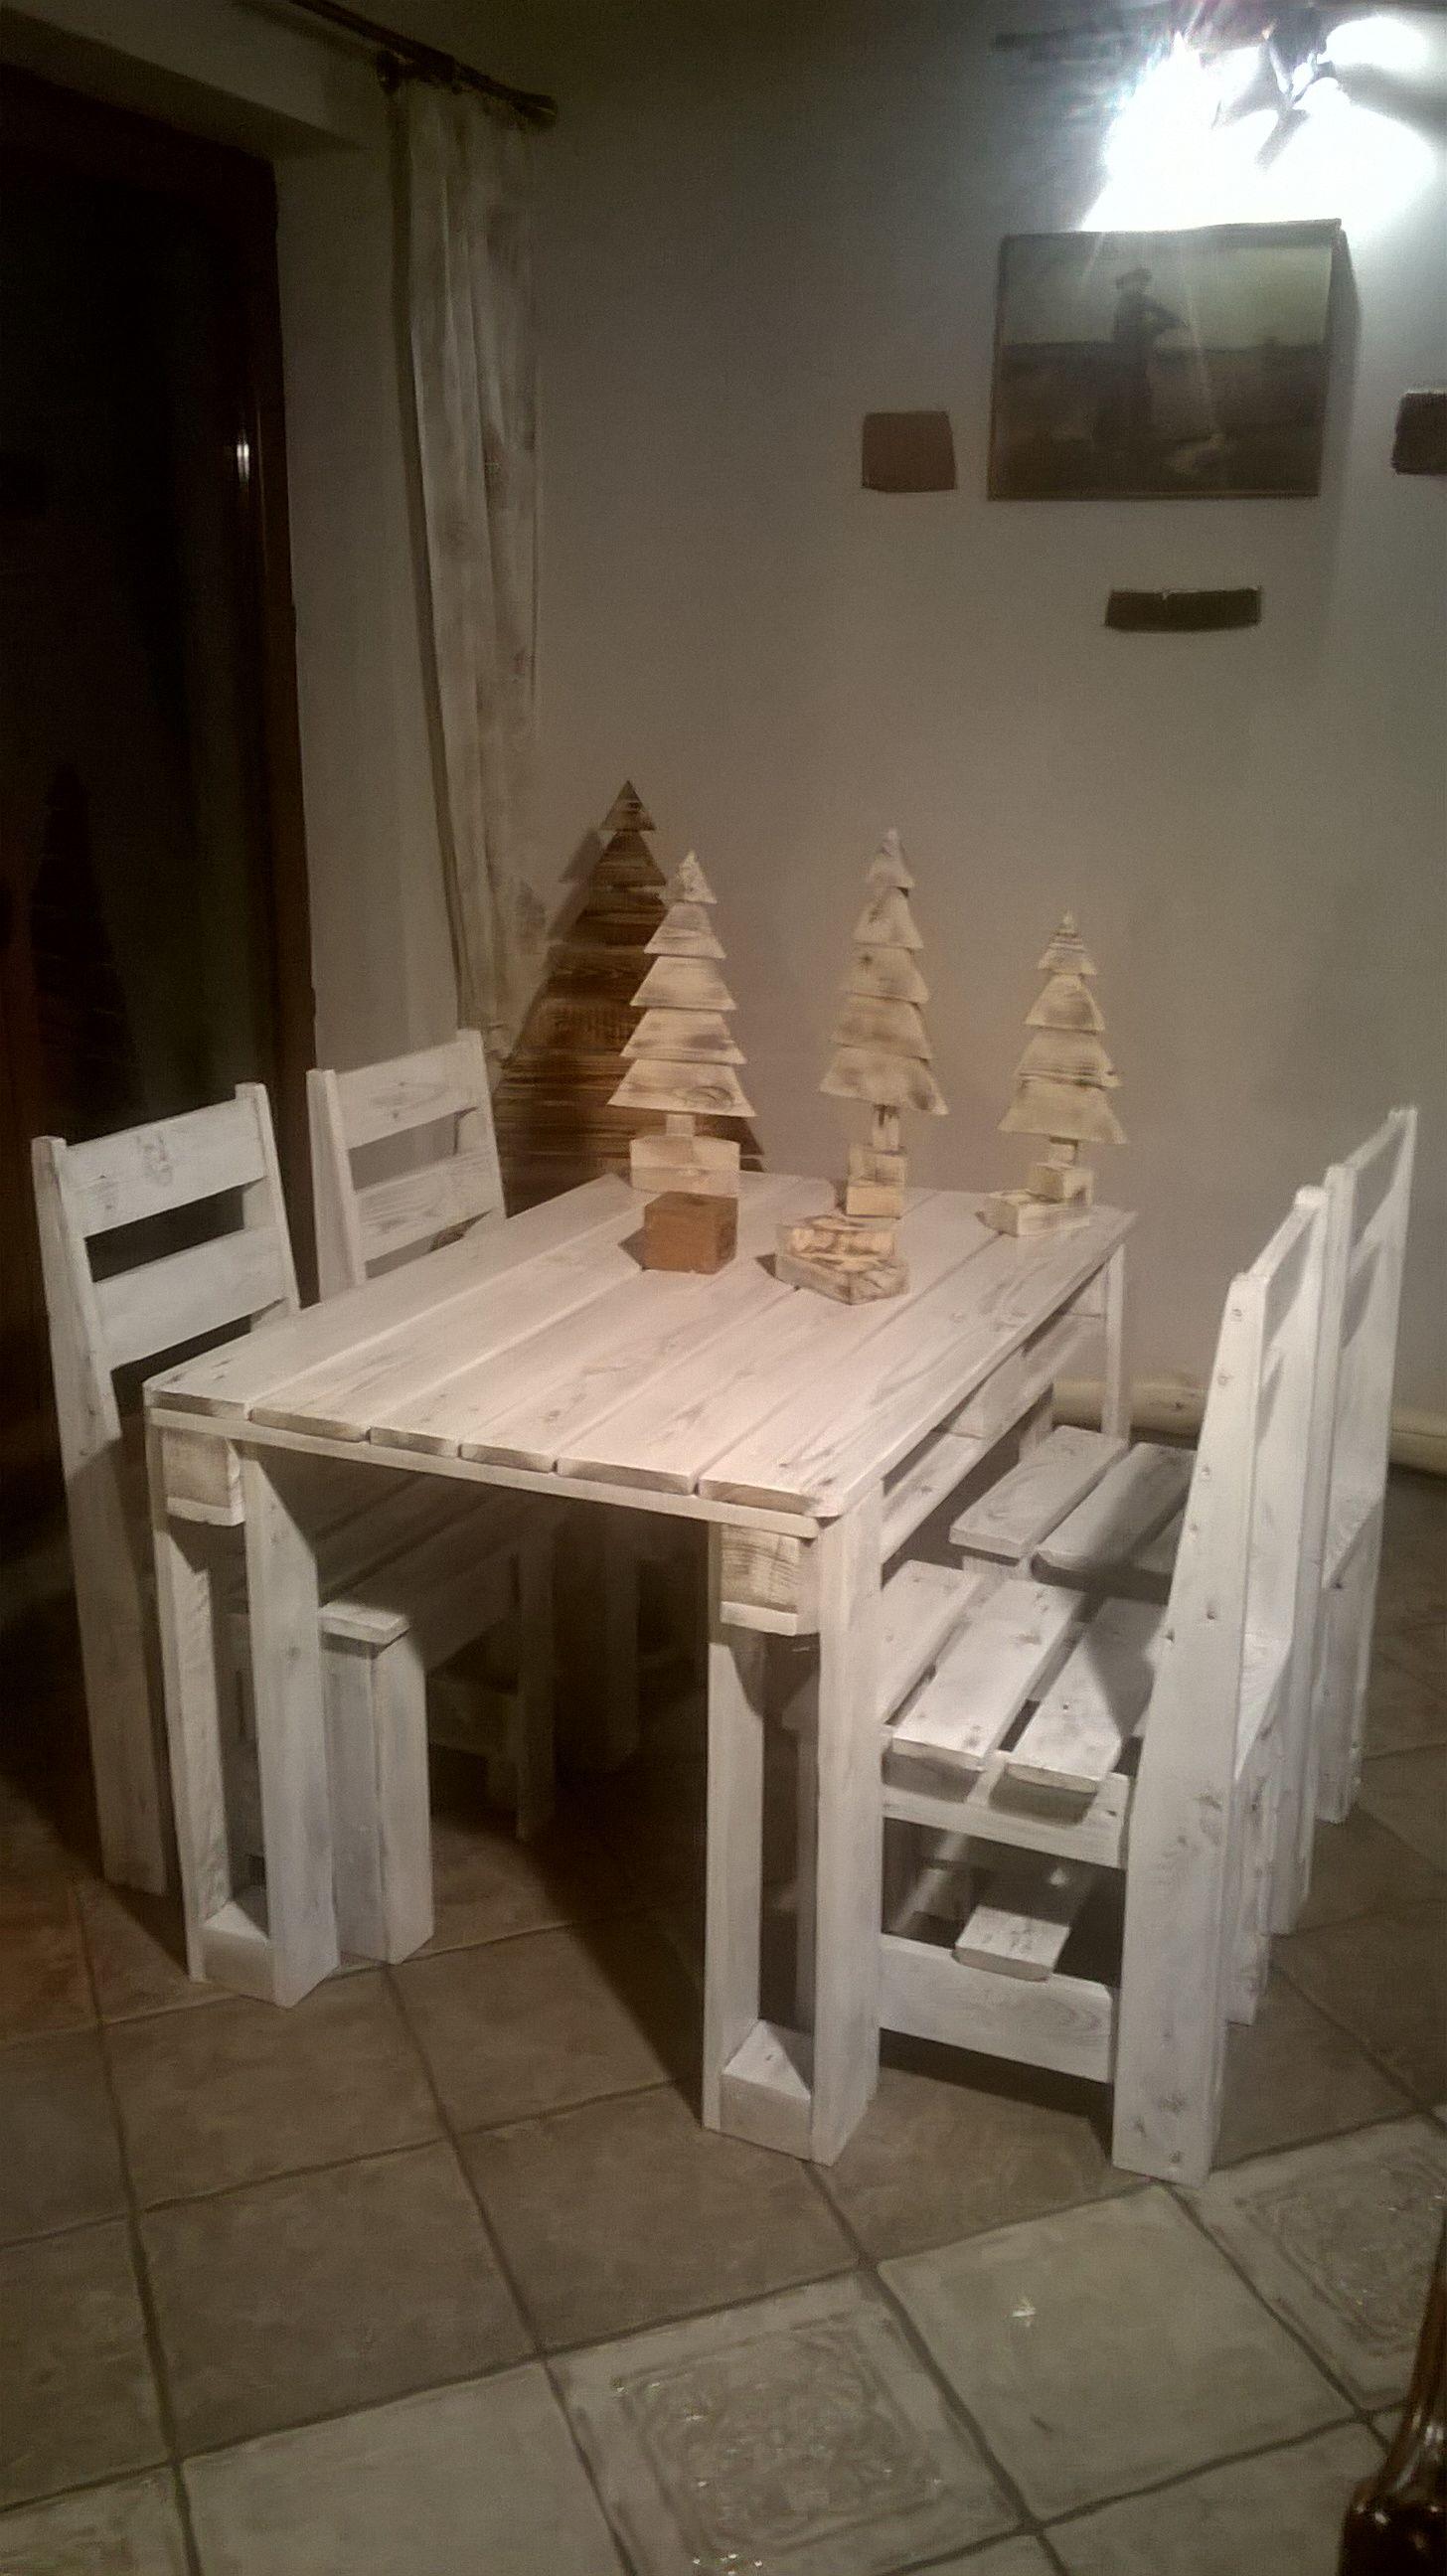 Meble Z Palet Https Www Facebook Com Zecomeblezpalet Wooden Pallet Table Pallet Furniture Pallet Table